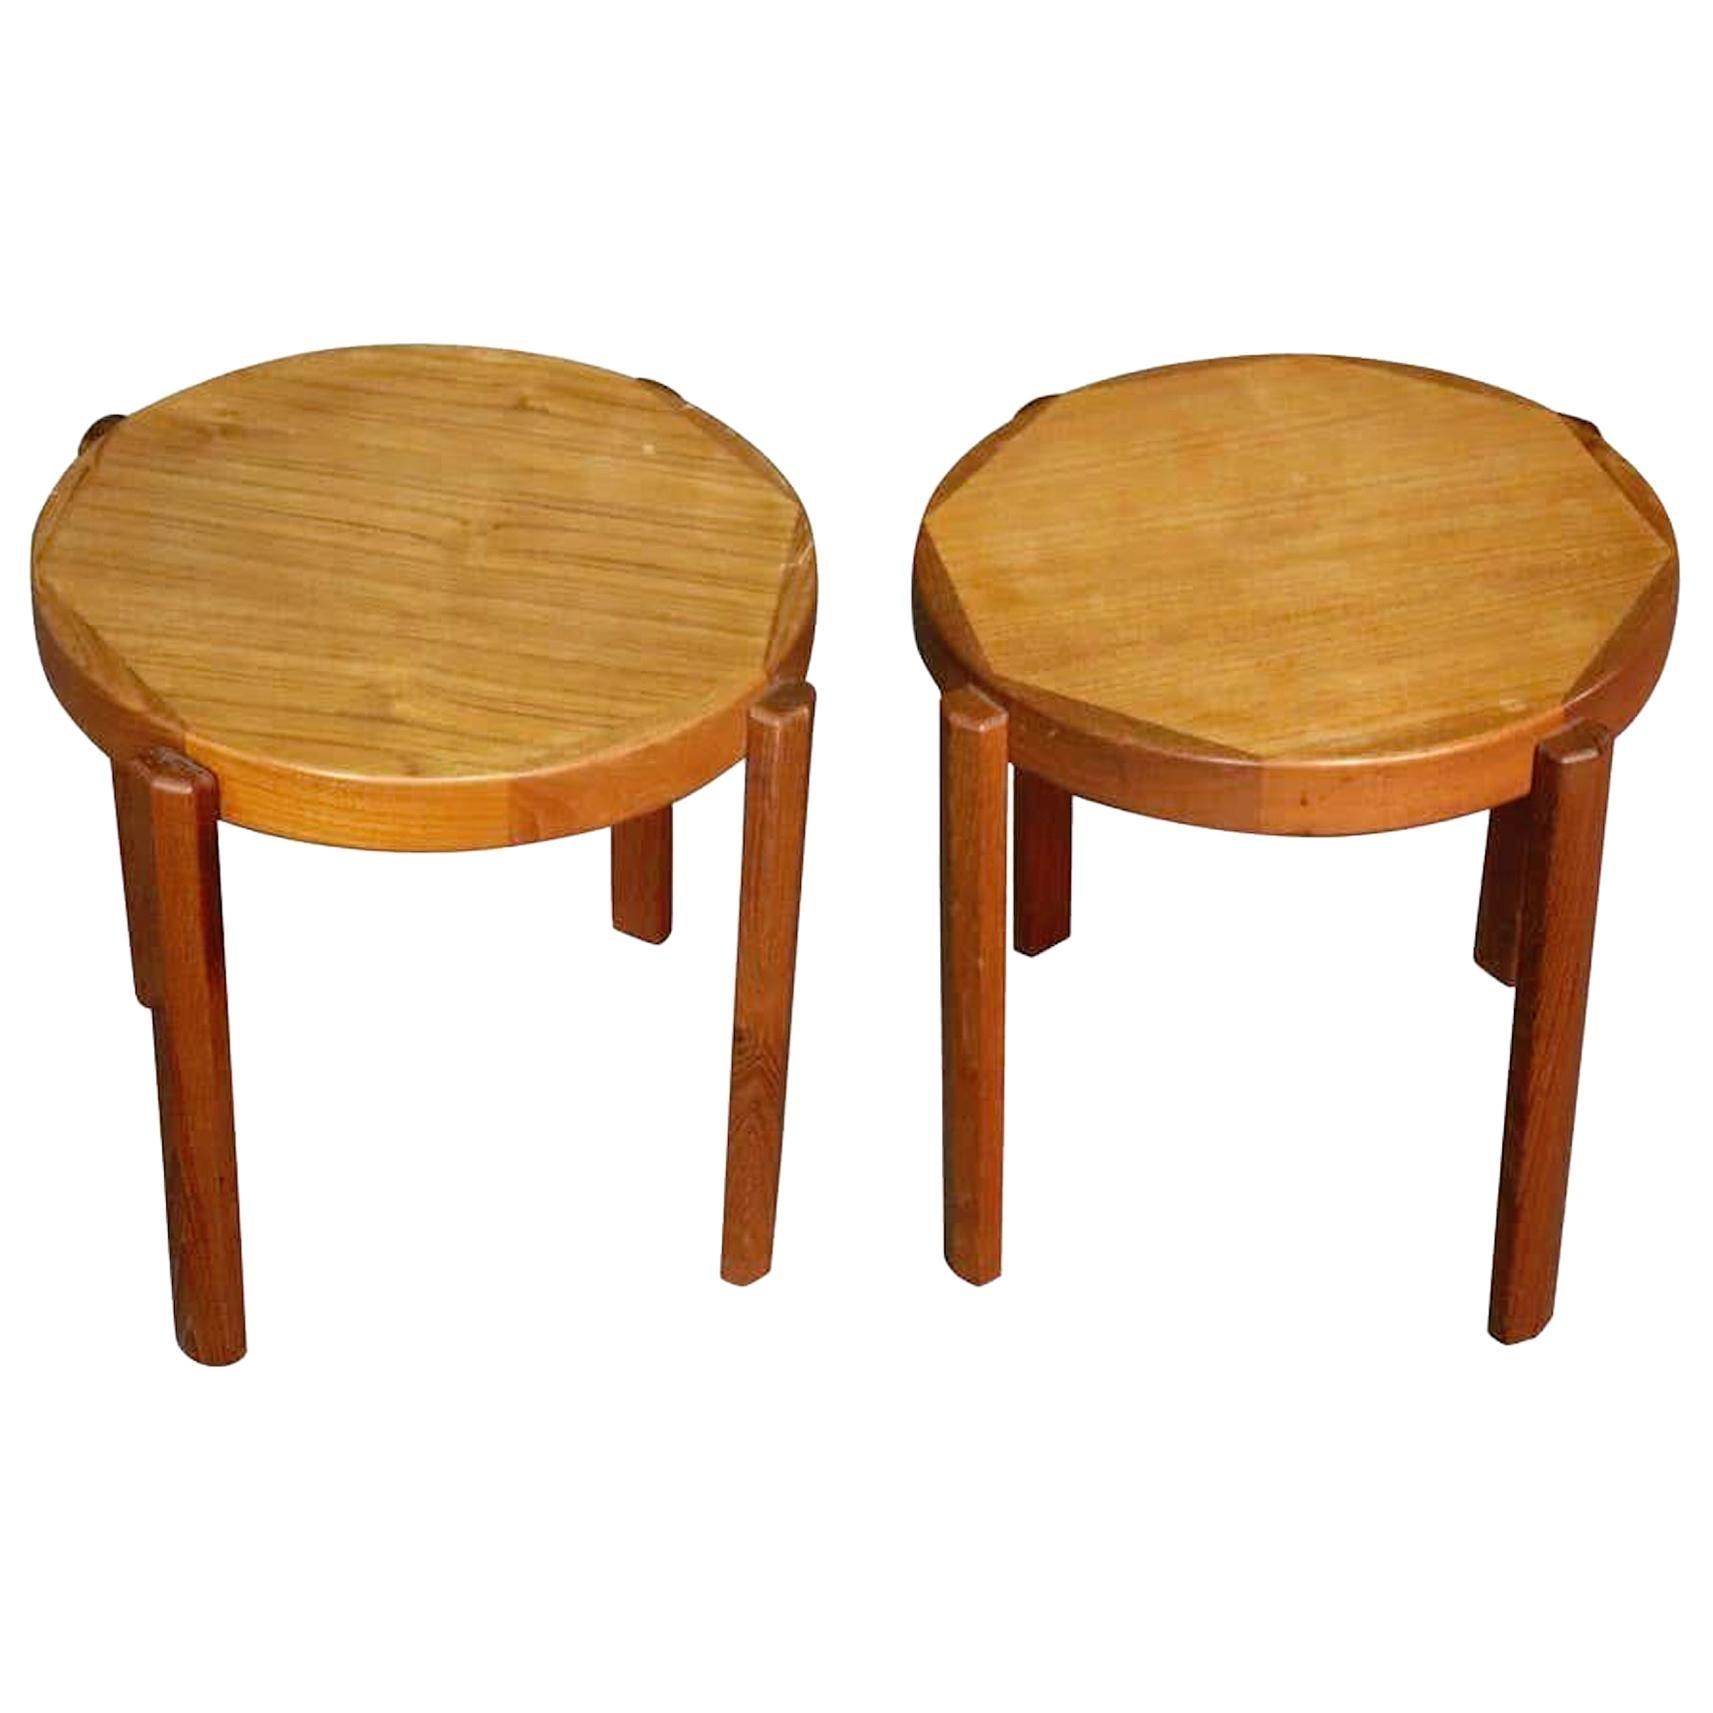 Danish Side Tables in Teak